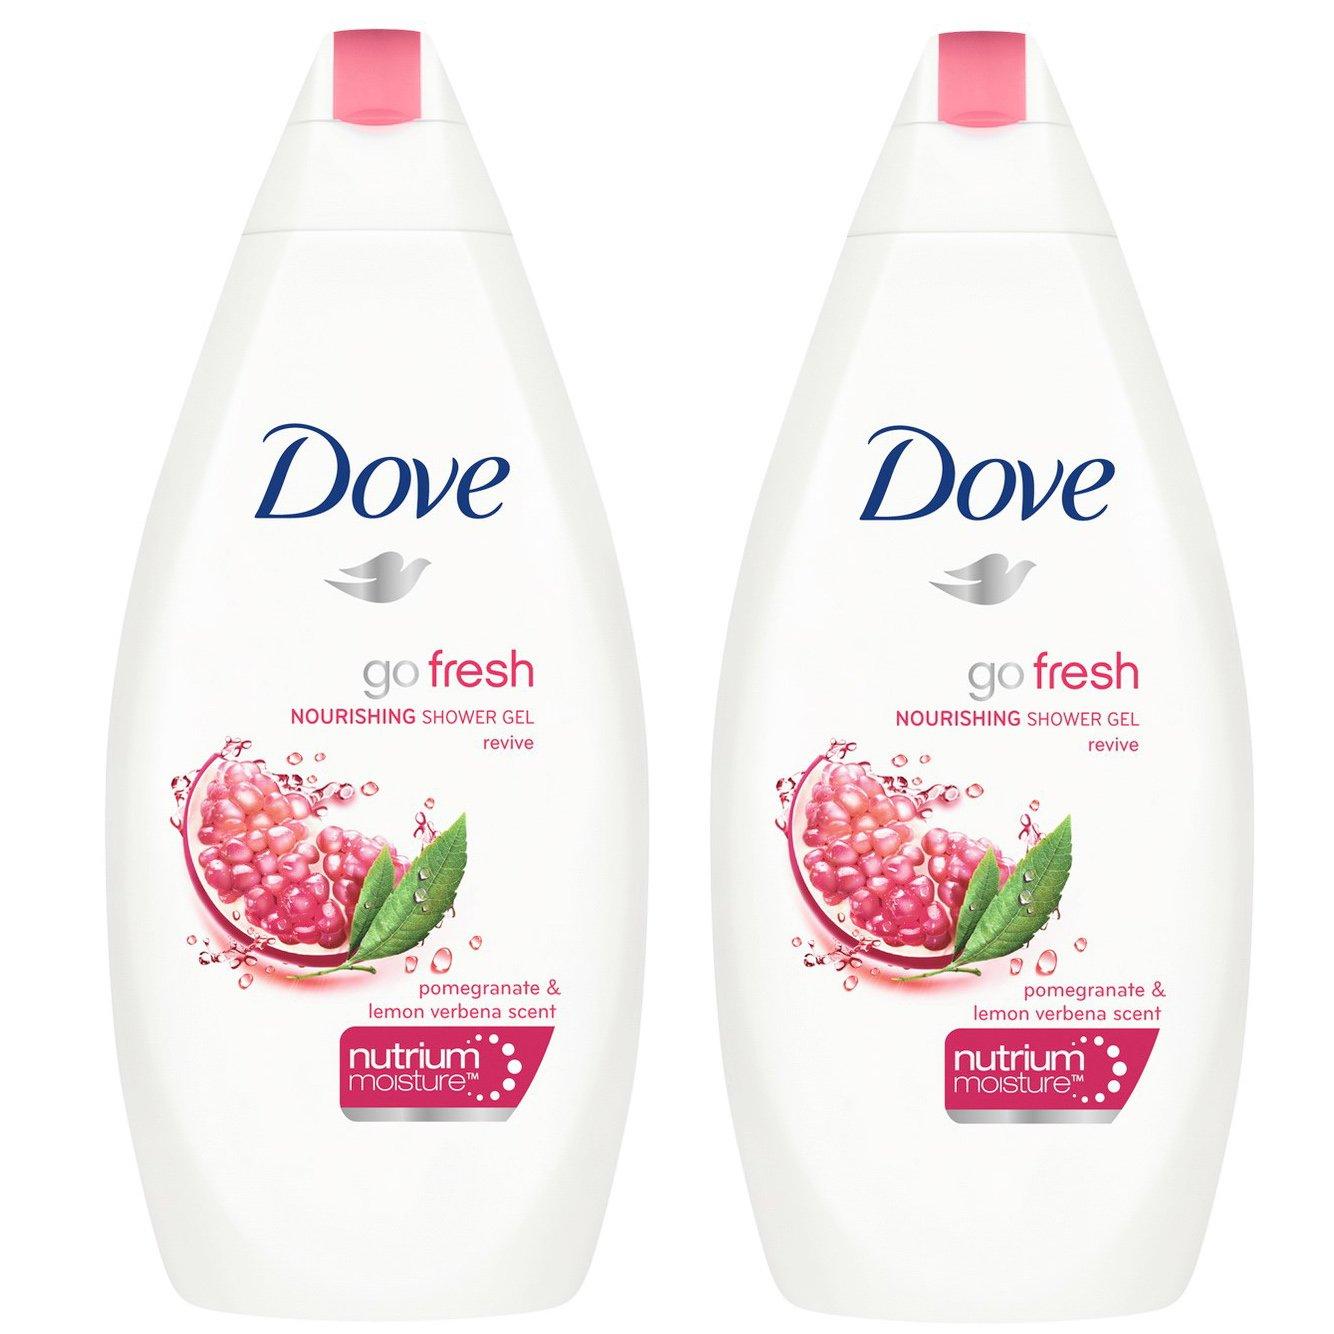 Dove Πακέτο Προσφοράς Go Fresh Pomegranate & Lemon Verbena Scent Body Wash Αφρόλουτρο με Ρόδι 2x750ml 1+1 Δώρο